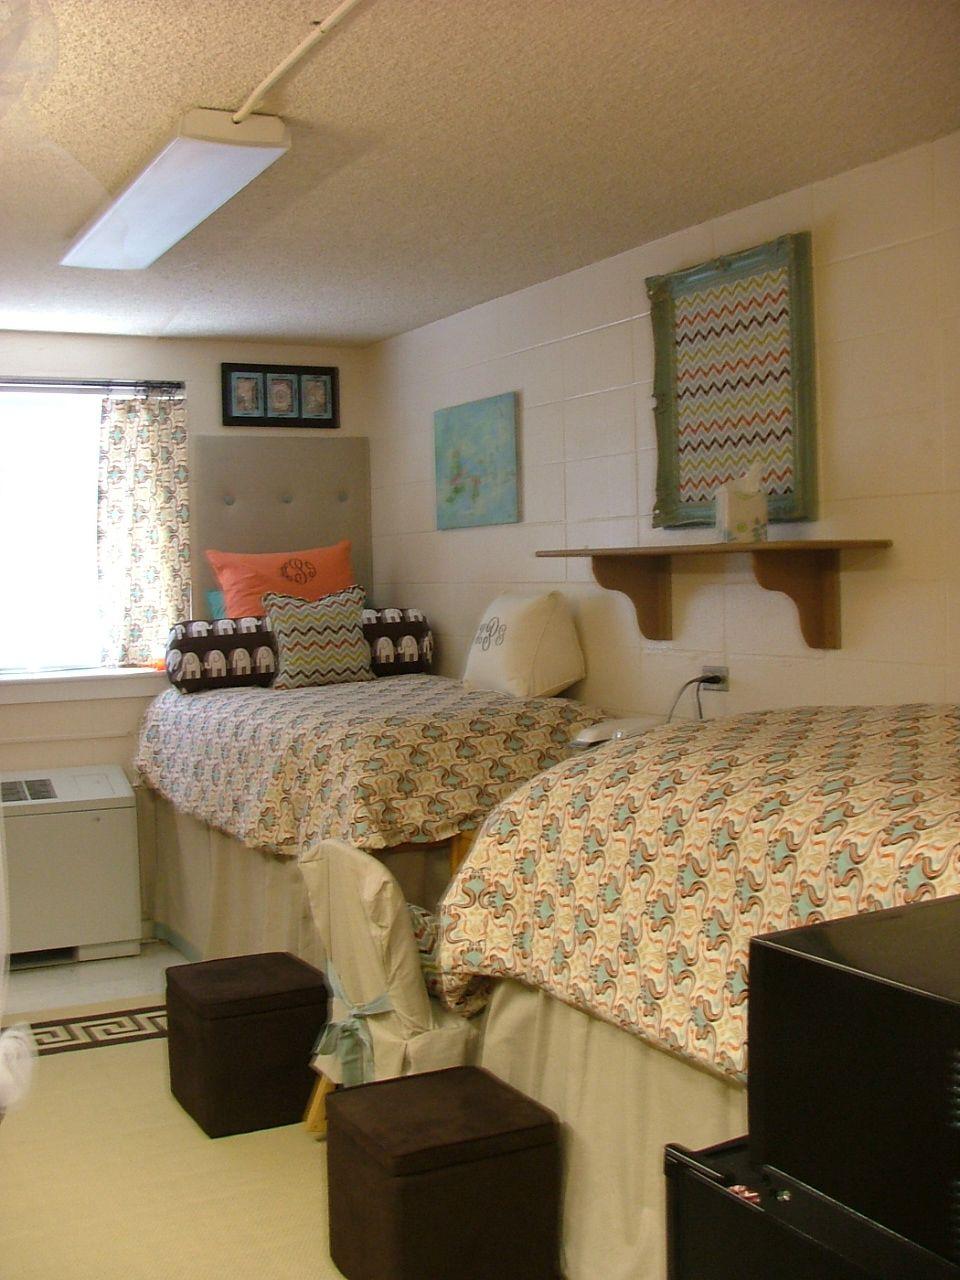 Decorate Dorm Room: Dorms Decor, Dorm